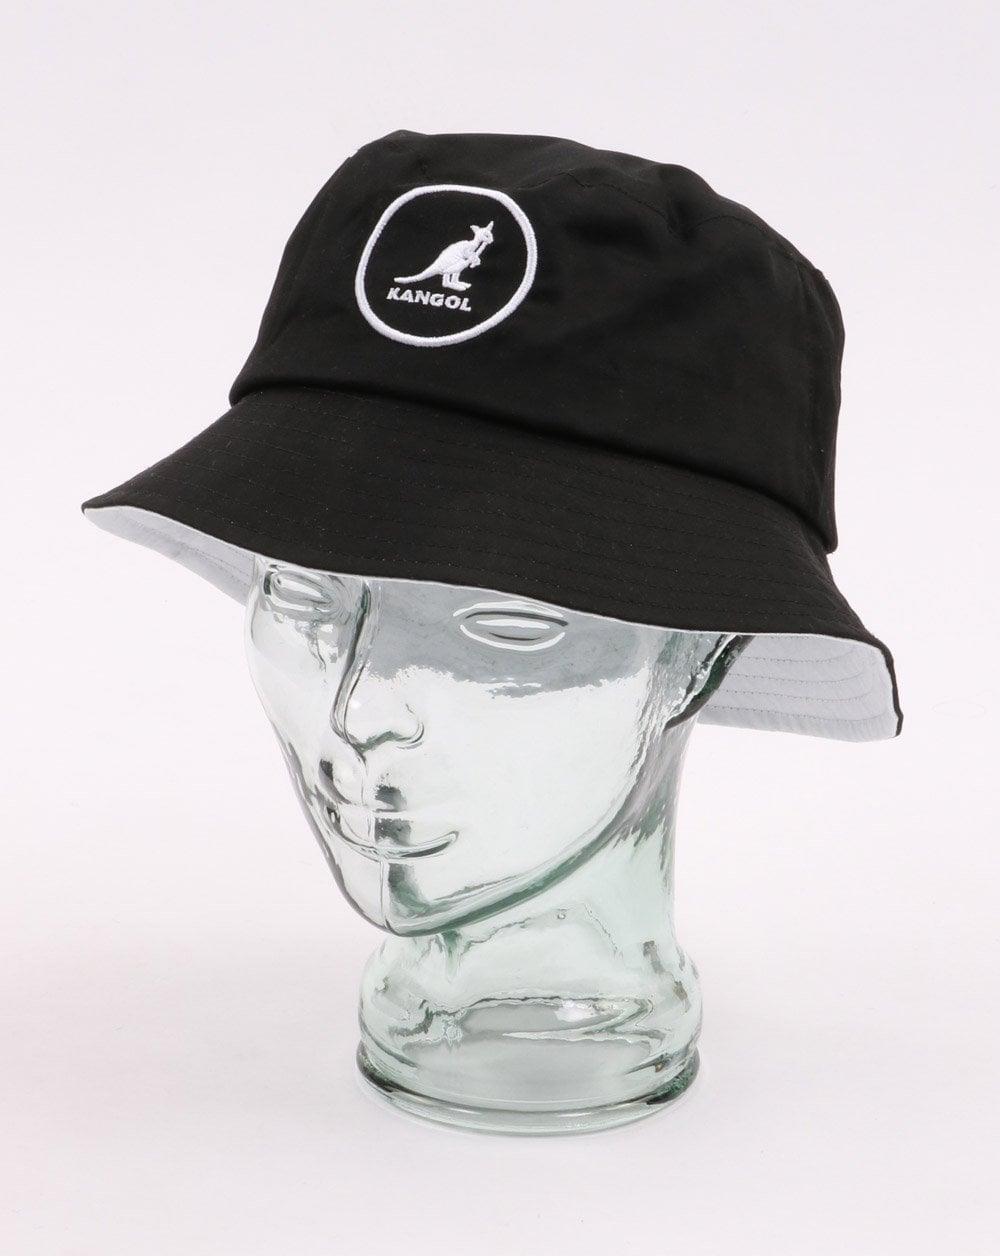 319a75b0bbc4bb Kangol Cotton Bucket Hat Black | 80s Casual Classics